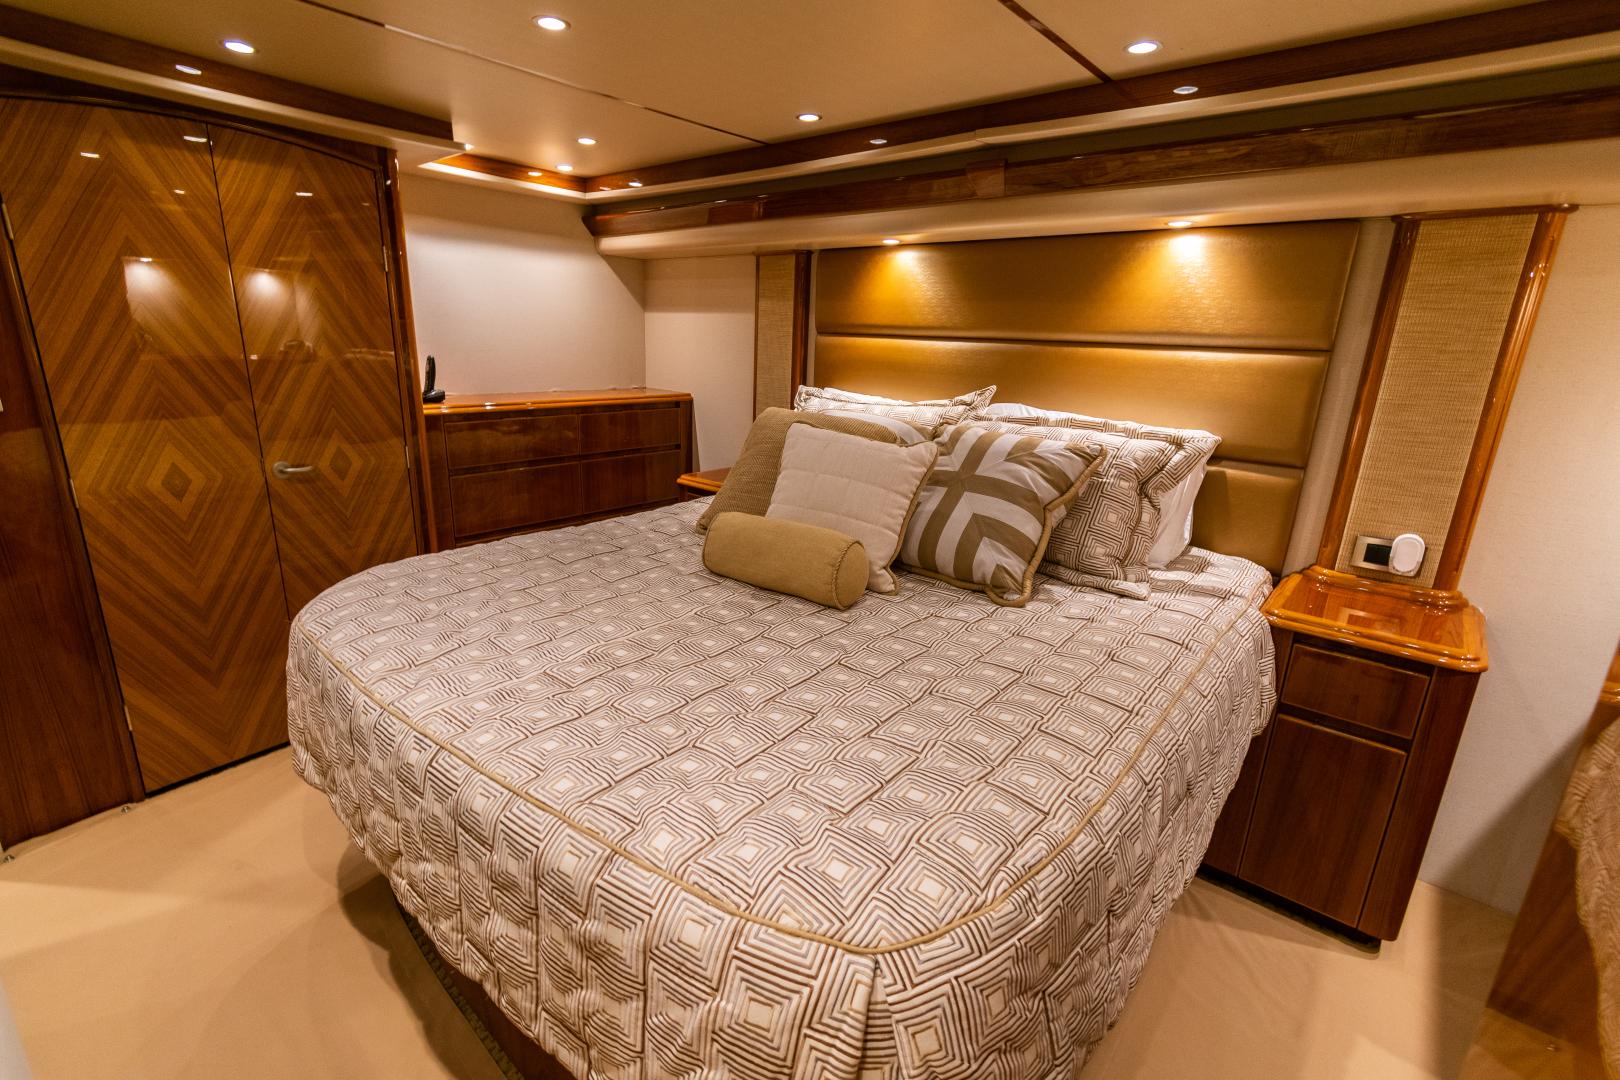 Viking-70 Convertible 2014-Load N Go Port Aransas-Texas-United States-2014 70 Viking Load N Go Master SR (3)-1380514 | Thumbnail